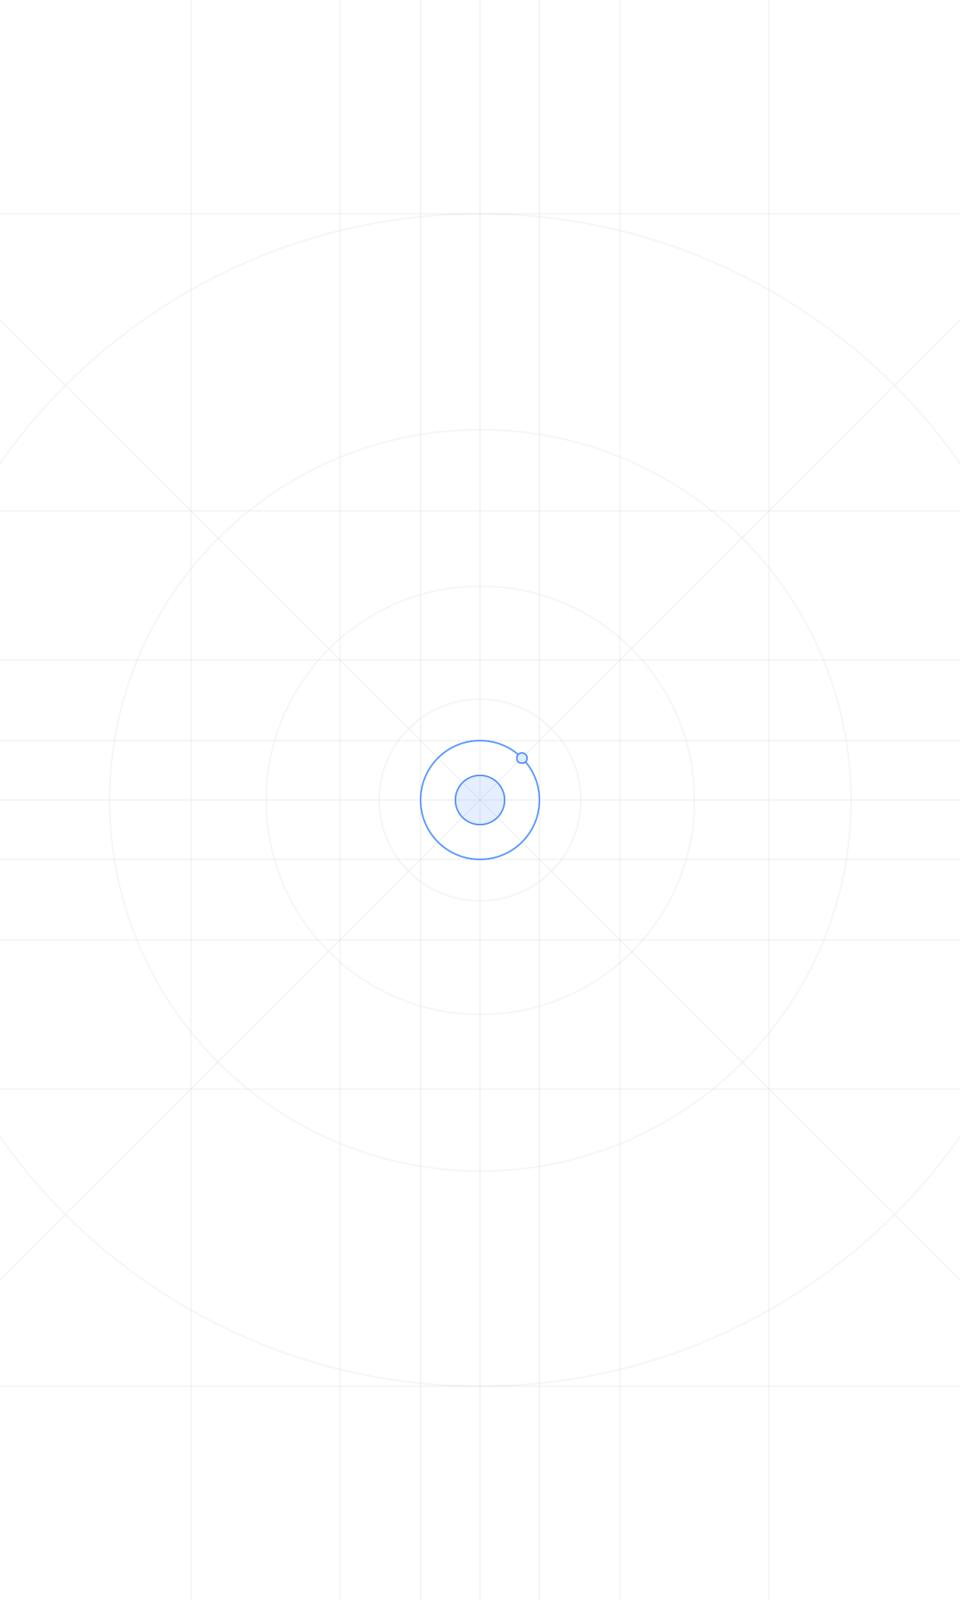 klu5/resources/android/splash/drawable-port-xxhdpi-screen.png